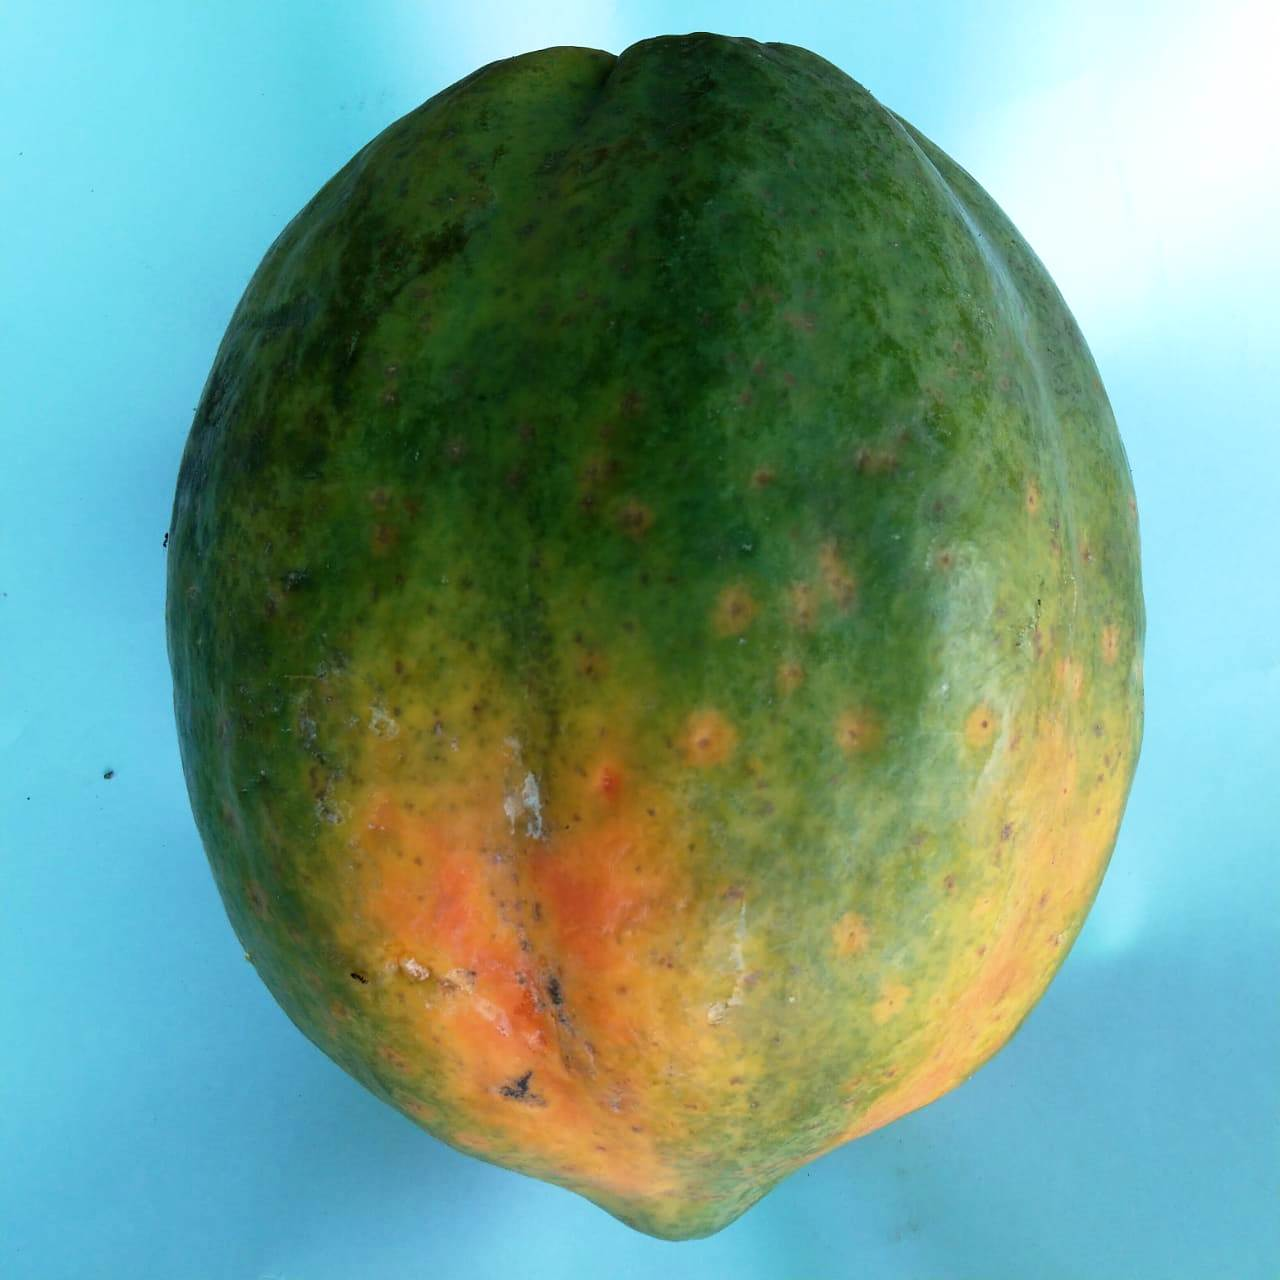 Papaya Per Piece